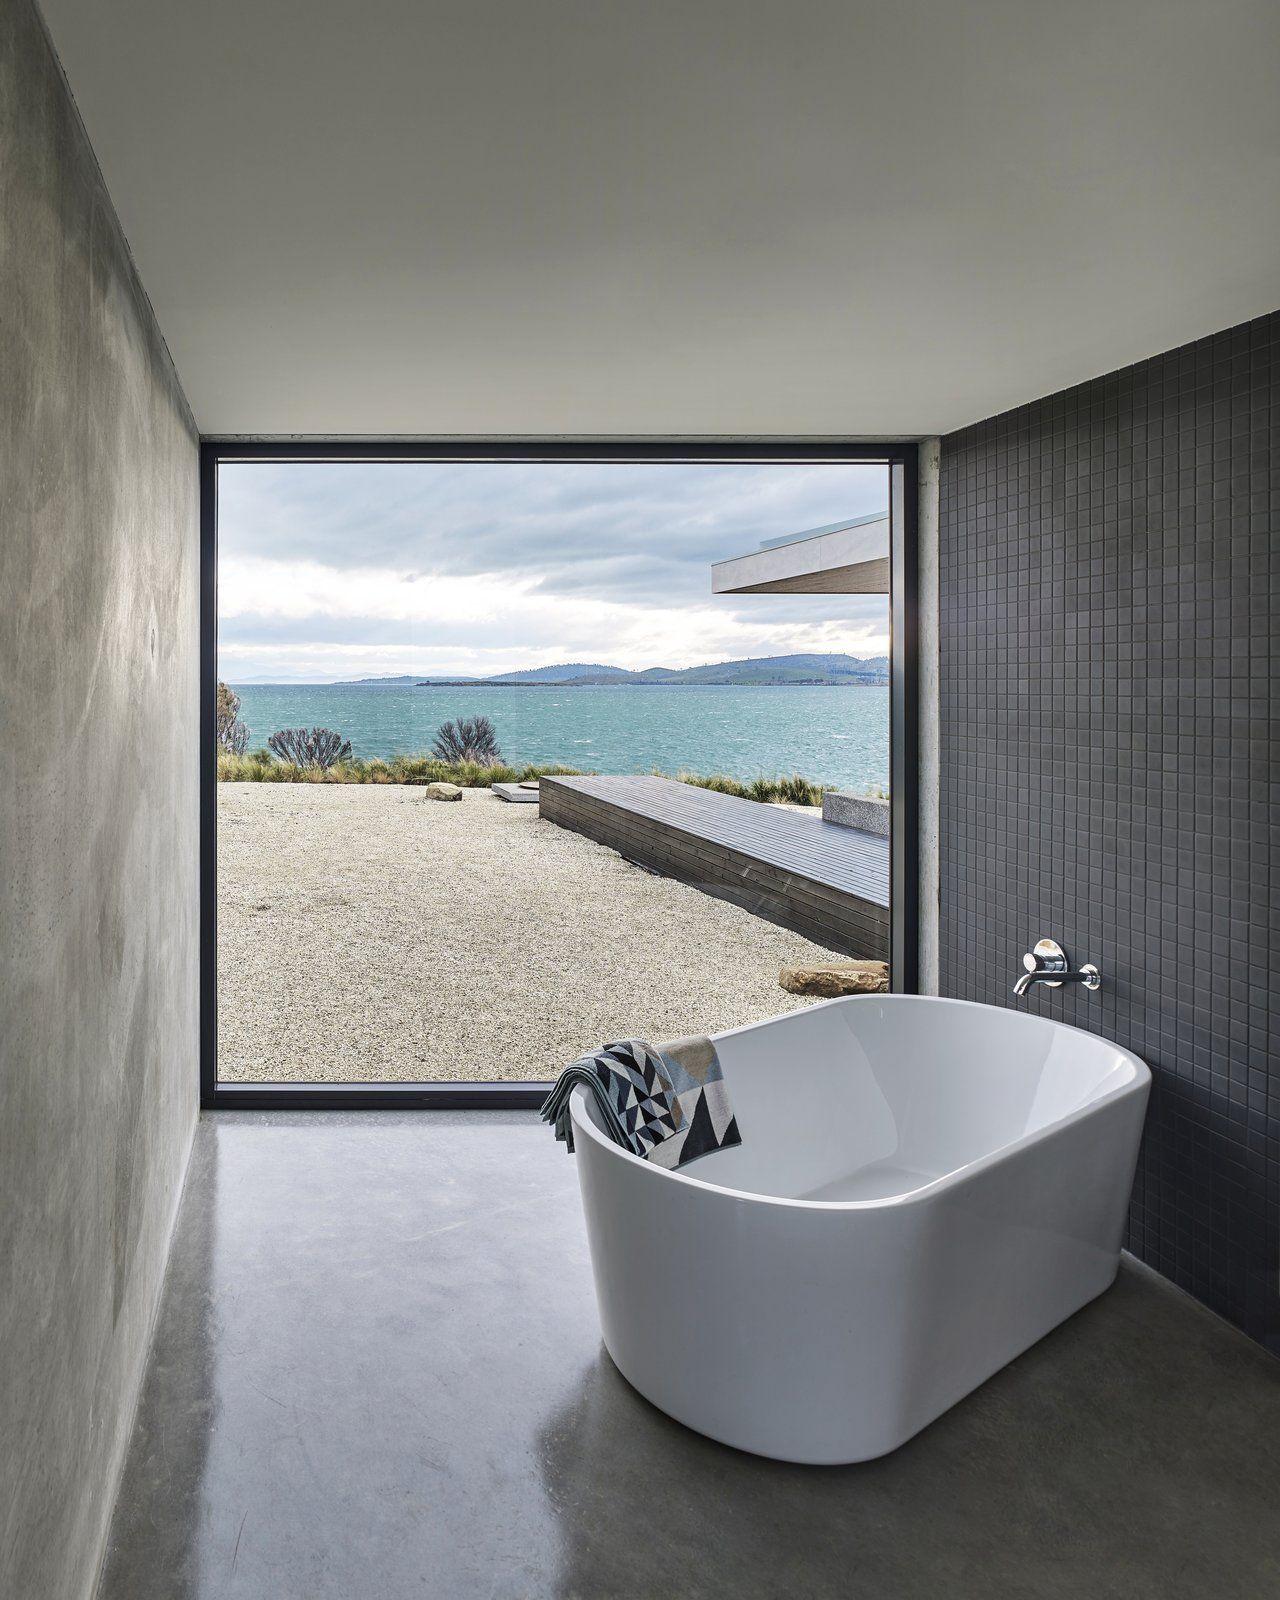 40 Modern Bathtubs That Soak In the View